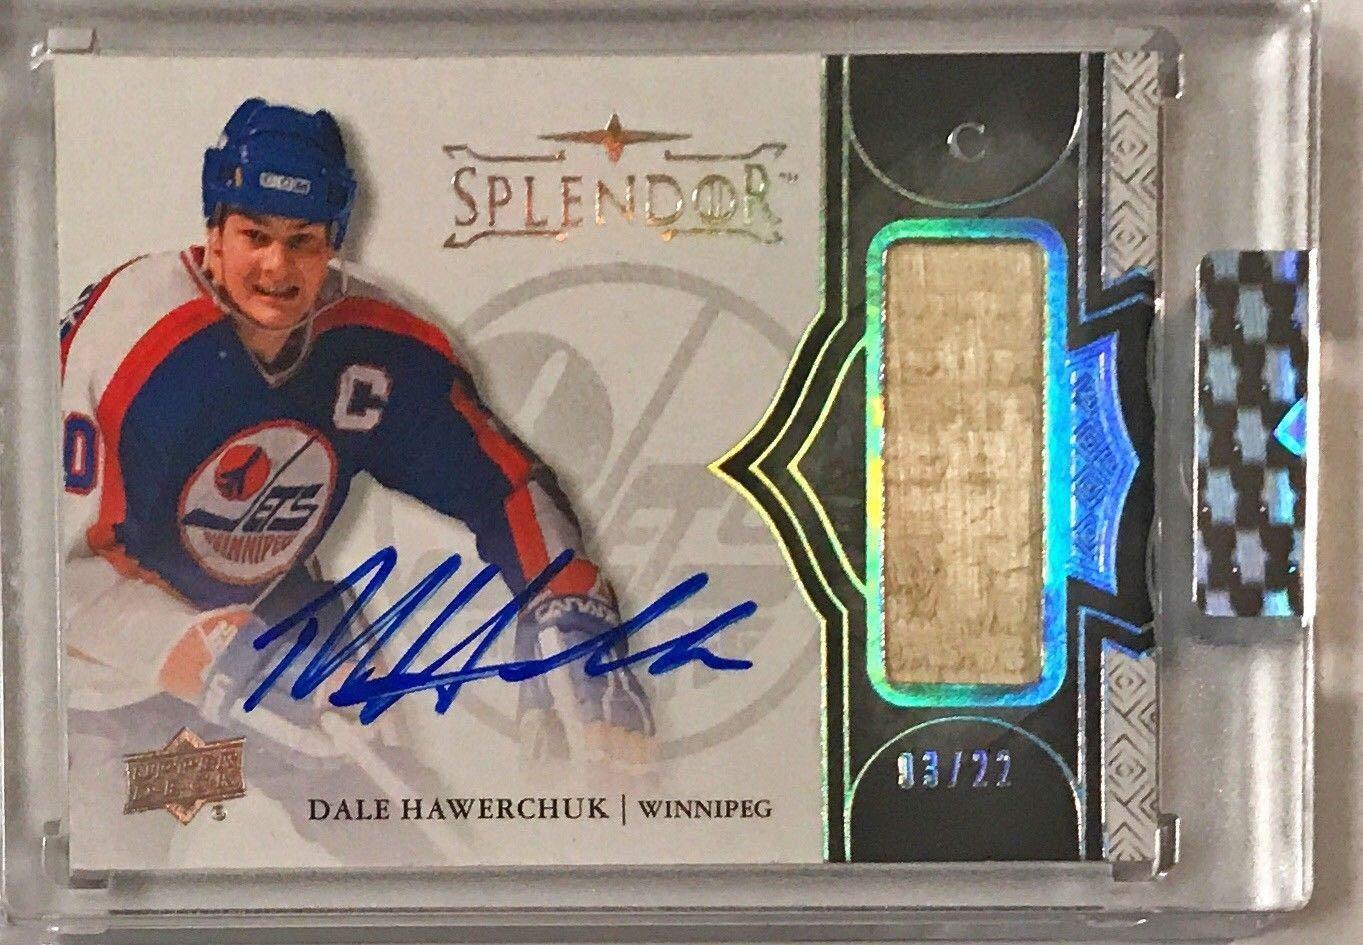 2017 18 Splendor Dale Hawerchuk Signed Auto Stick Card #'d 03/22 Upper Deck Certified Autographed NHL Sticks